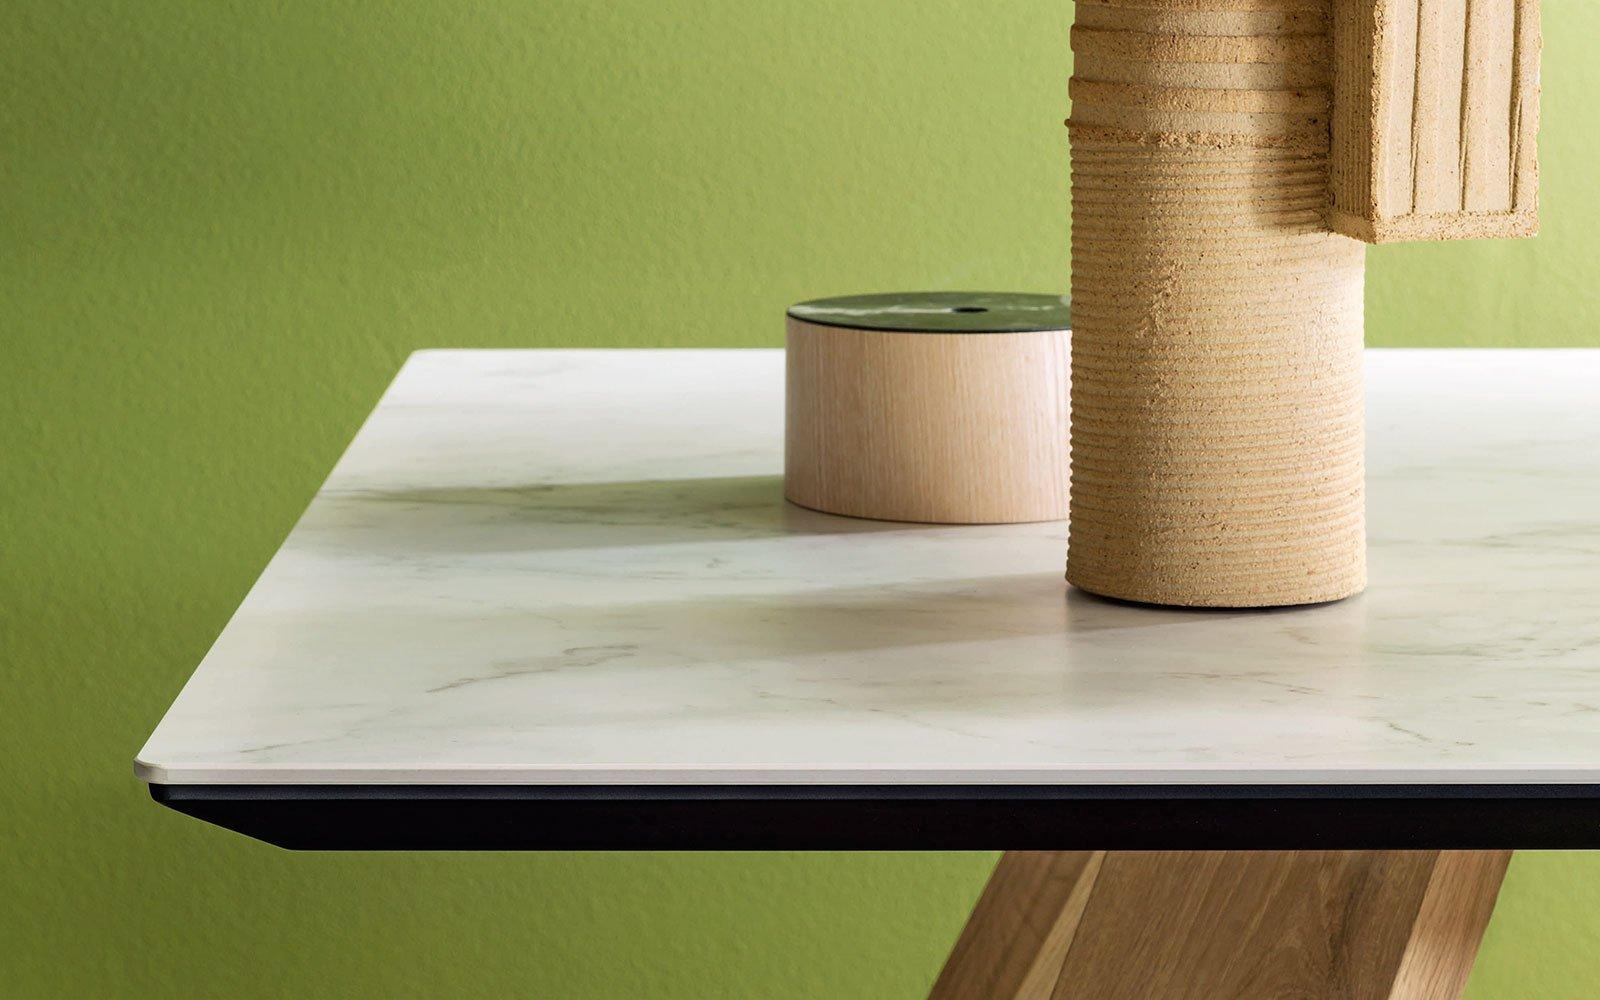 Artigiano modern Wooden Dining Table